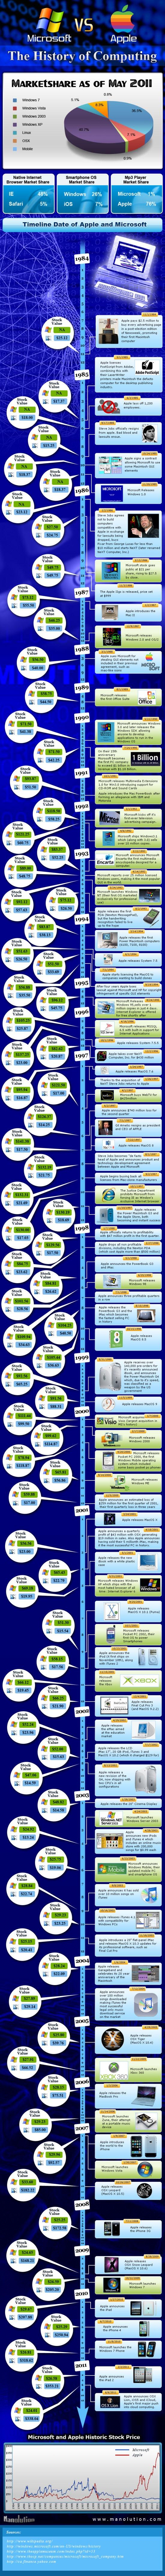 history-of-computing-full_MS-Vs-Apple